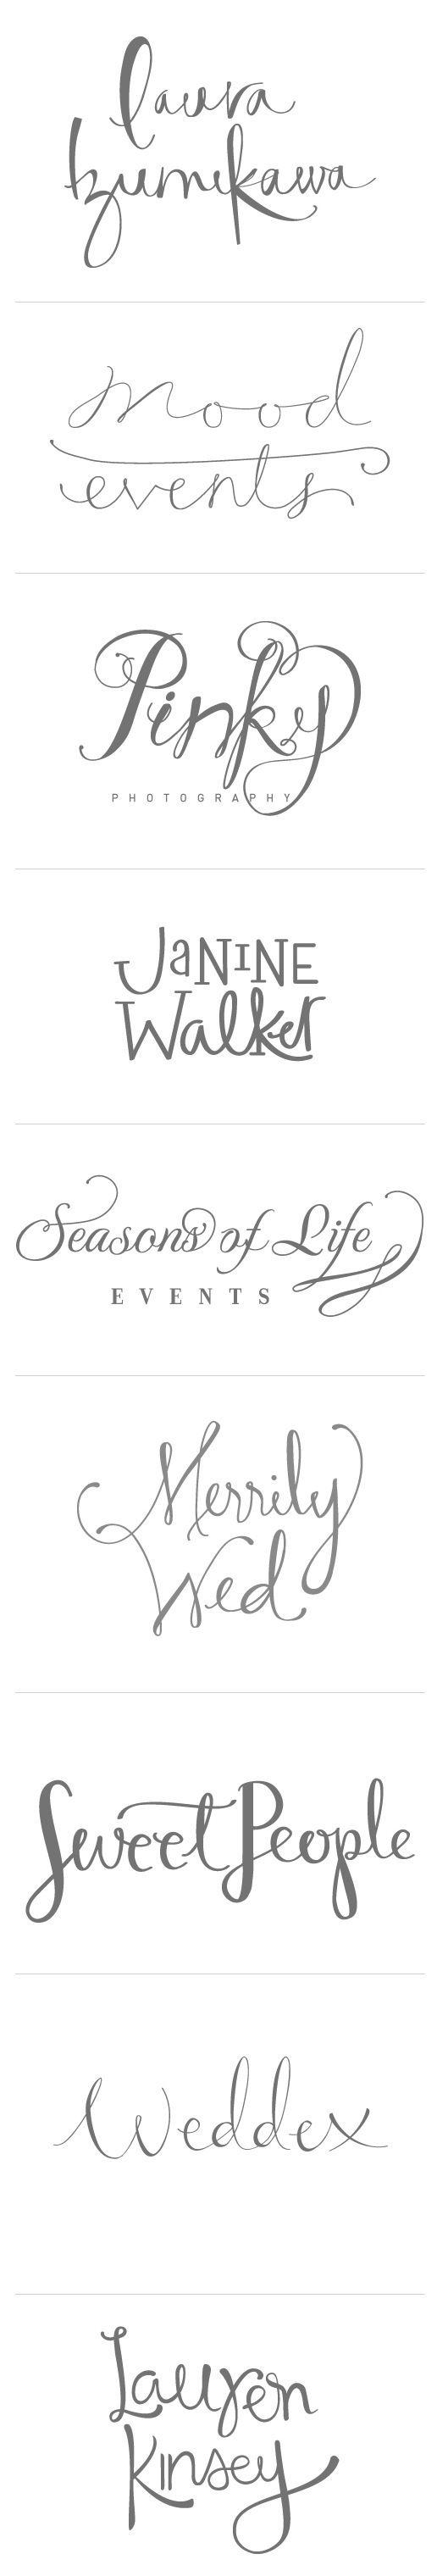 Various calligraphy logos pinterest